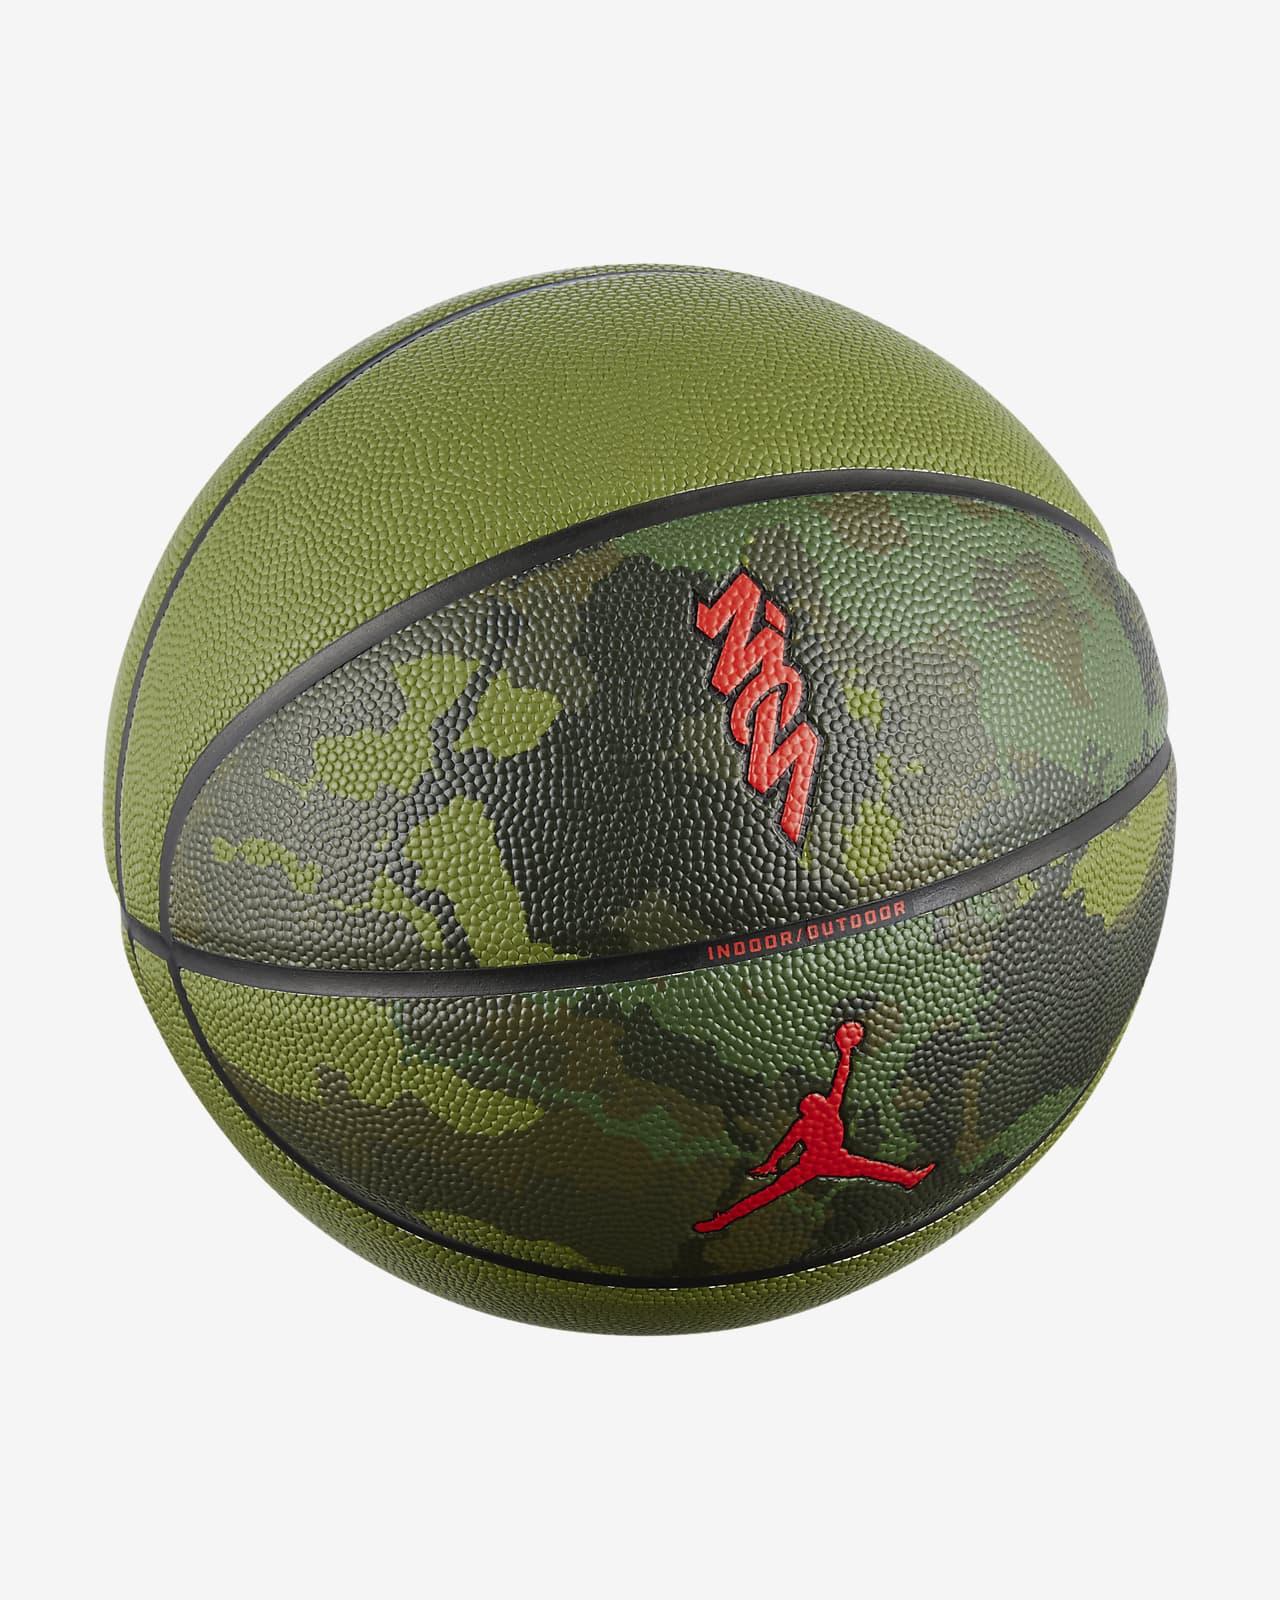 Zion All-Court 8P Basketball